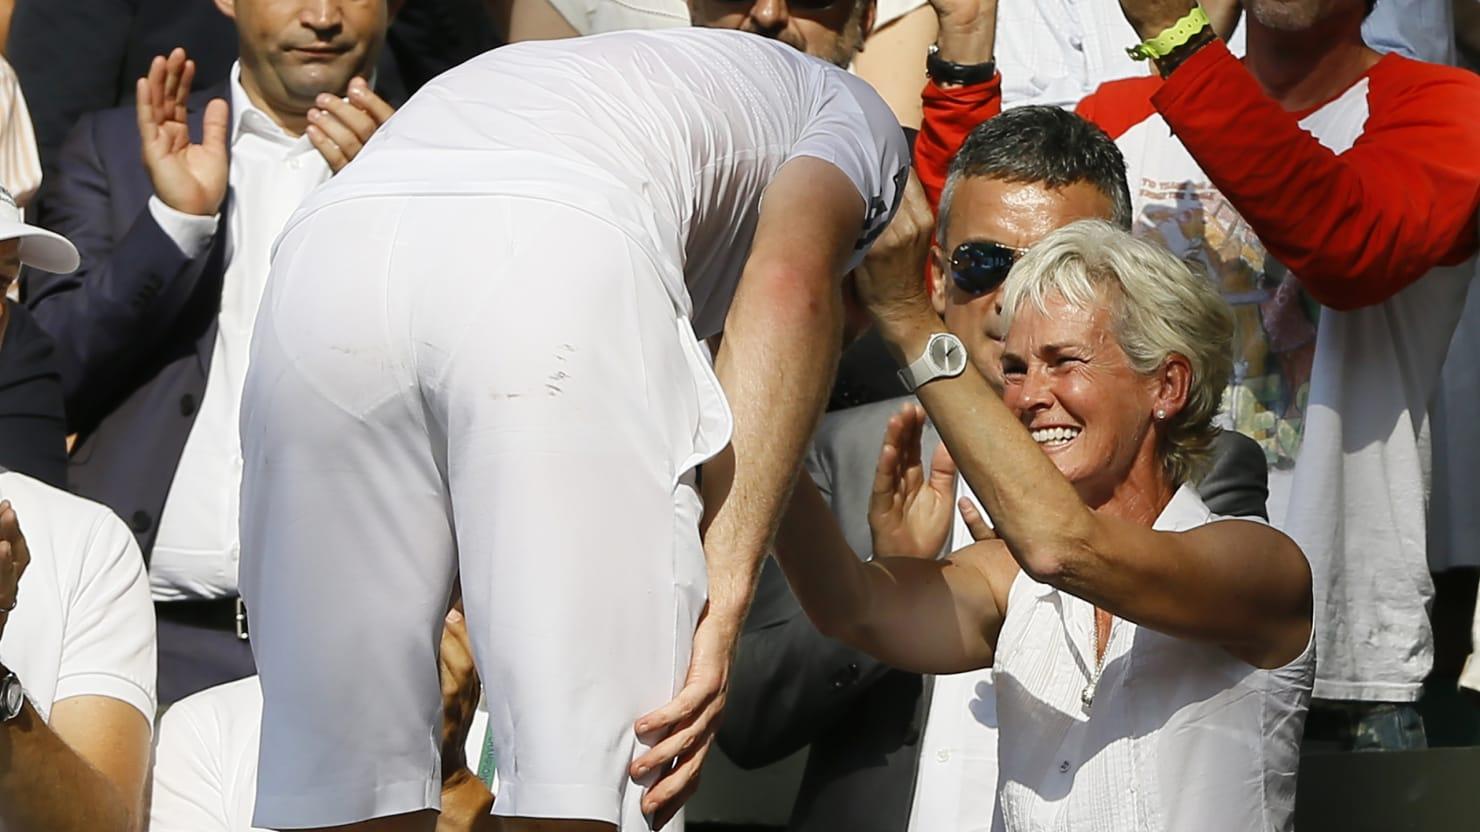 Andy Murray Survived Dunblane School Massacre Before Winning Wimbledon